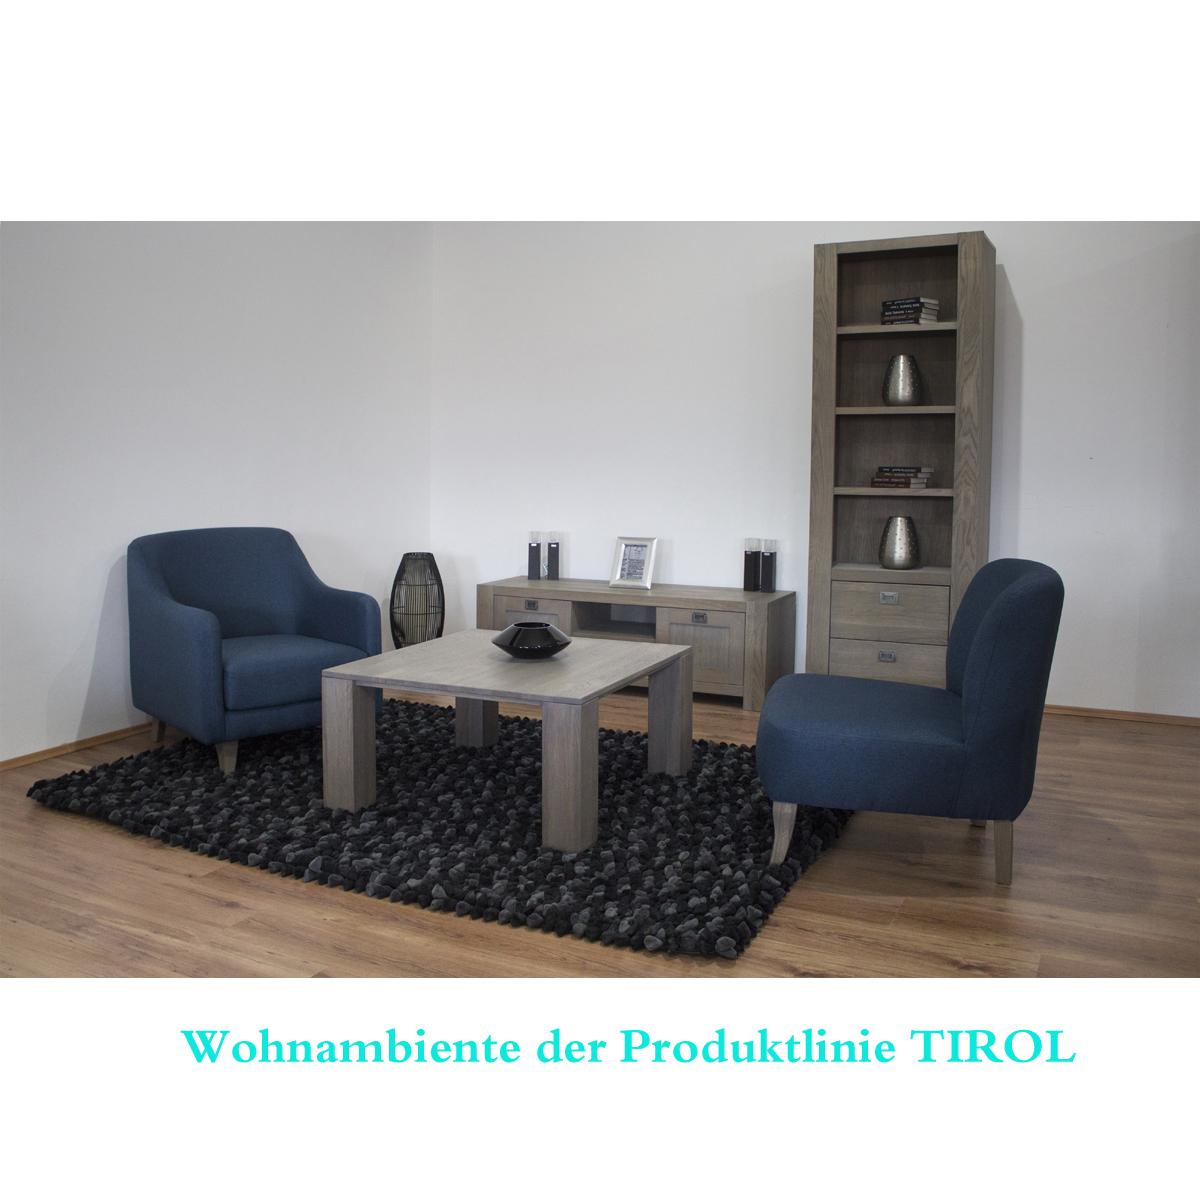 kurze tv kommode tirol aus eiche moebel trend 24. Black Bedroom Furniture Sets. Home Design Ideas